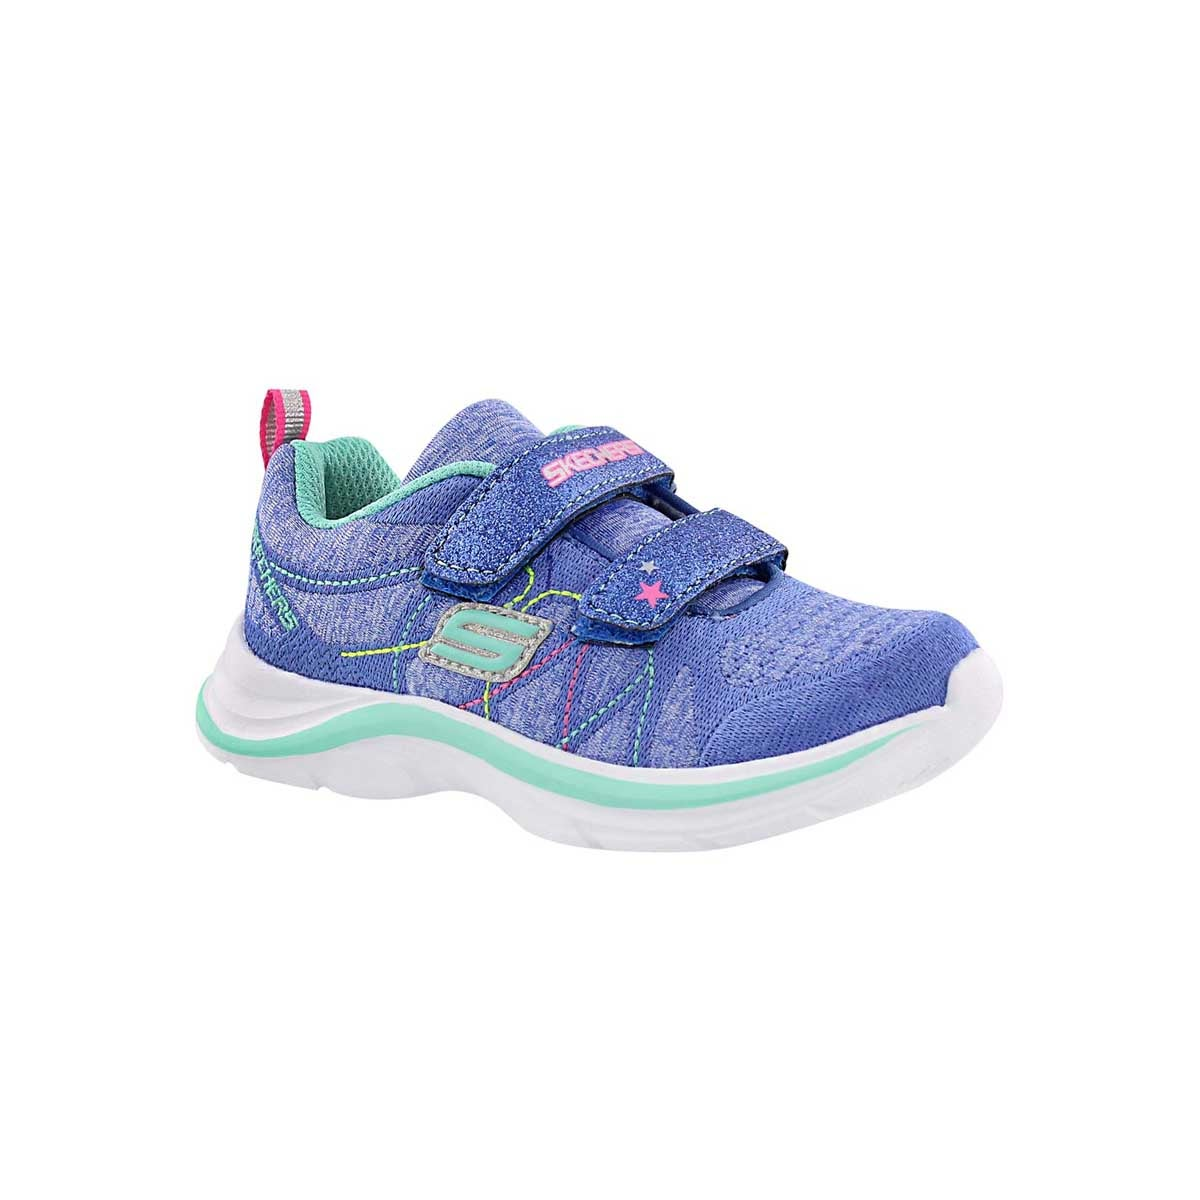 Infants' GLAMMER GAMES blue/aqua sneakers